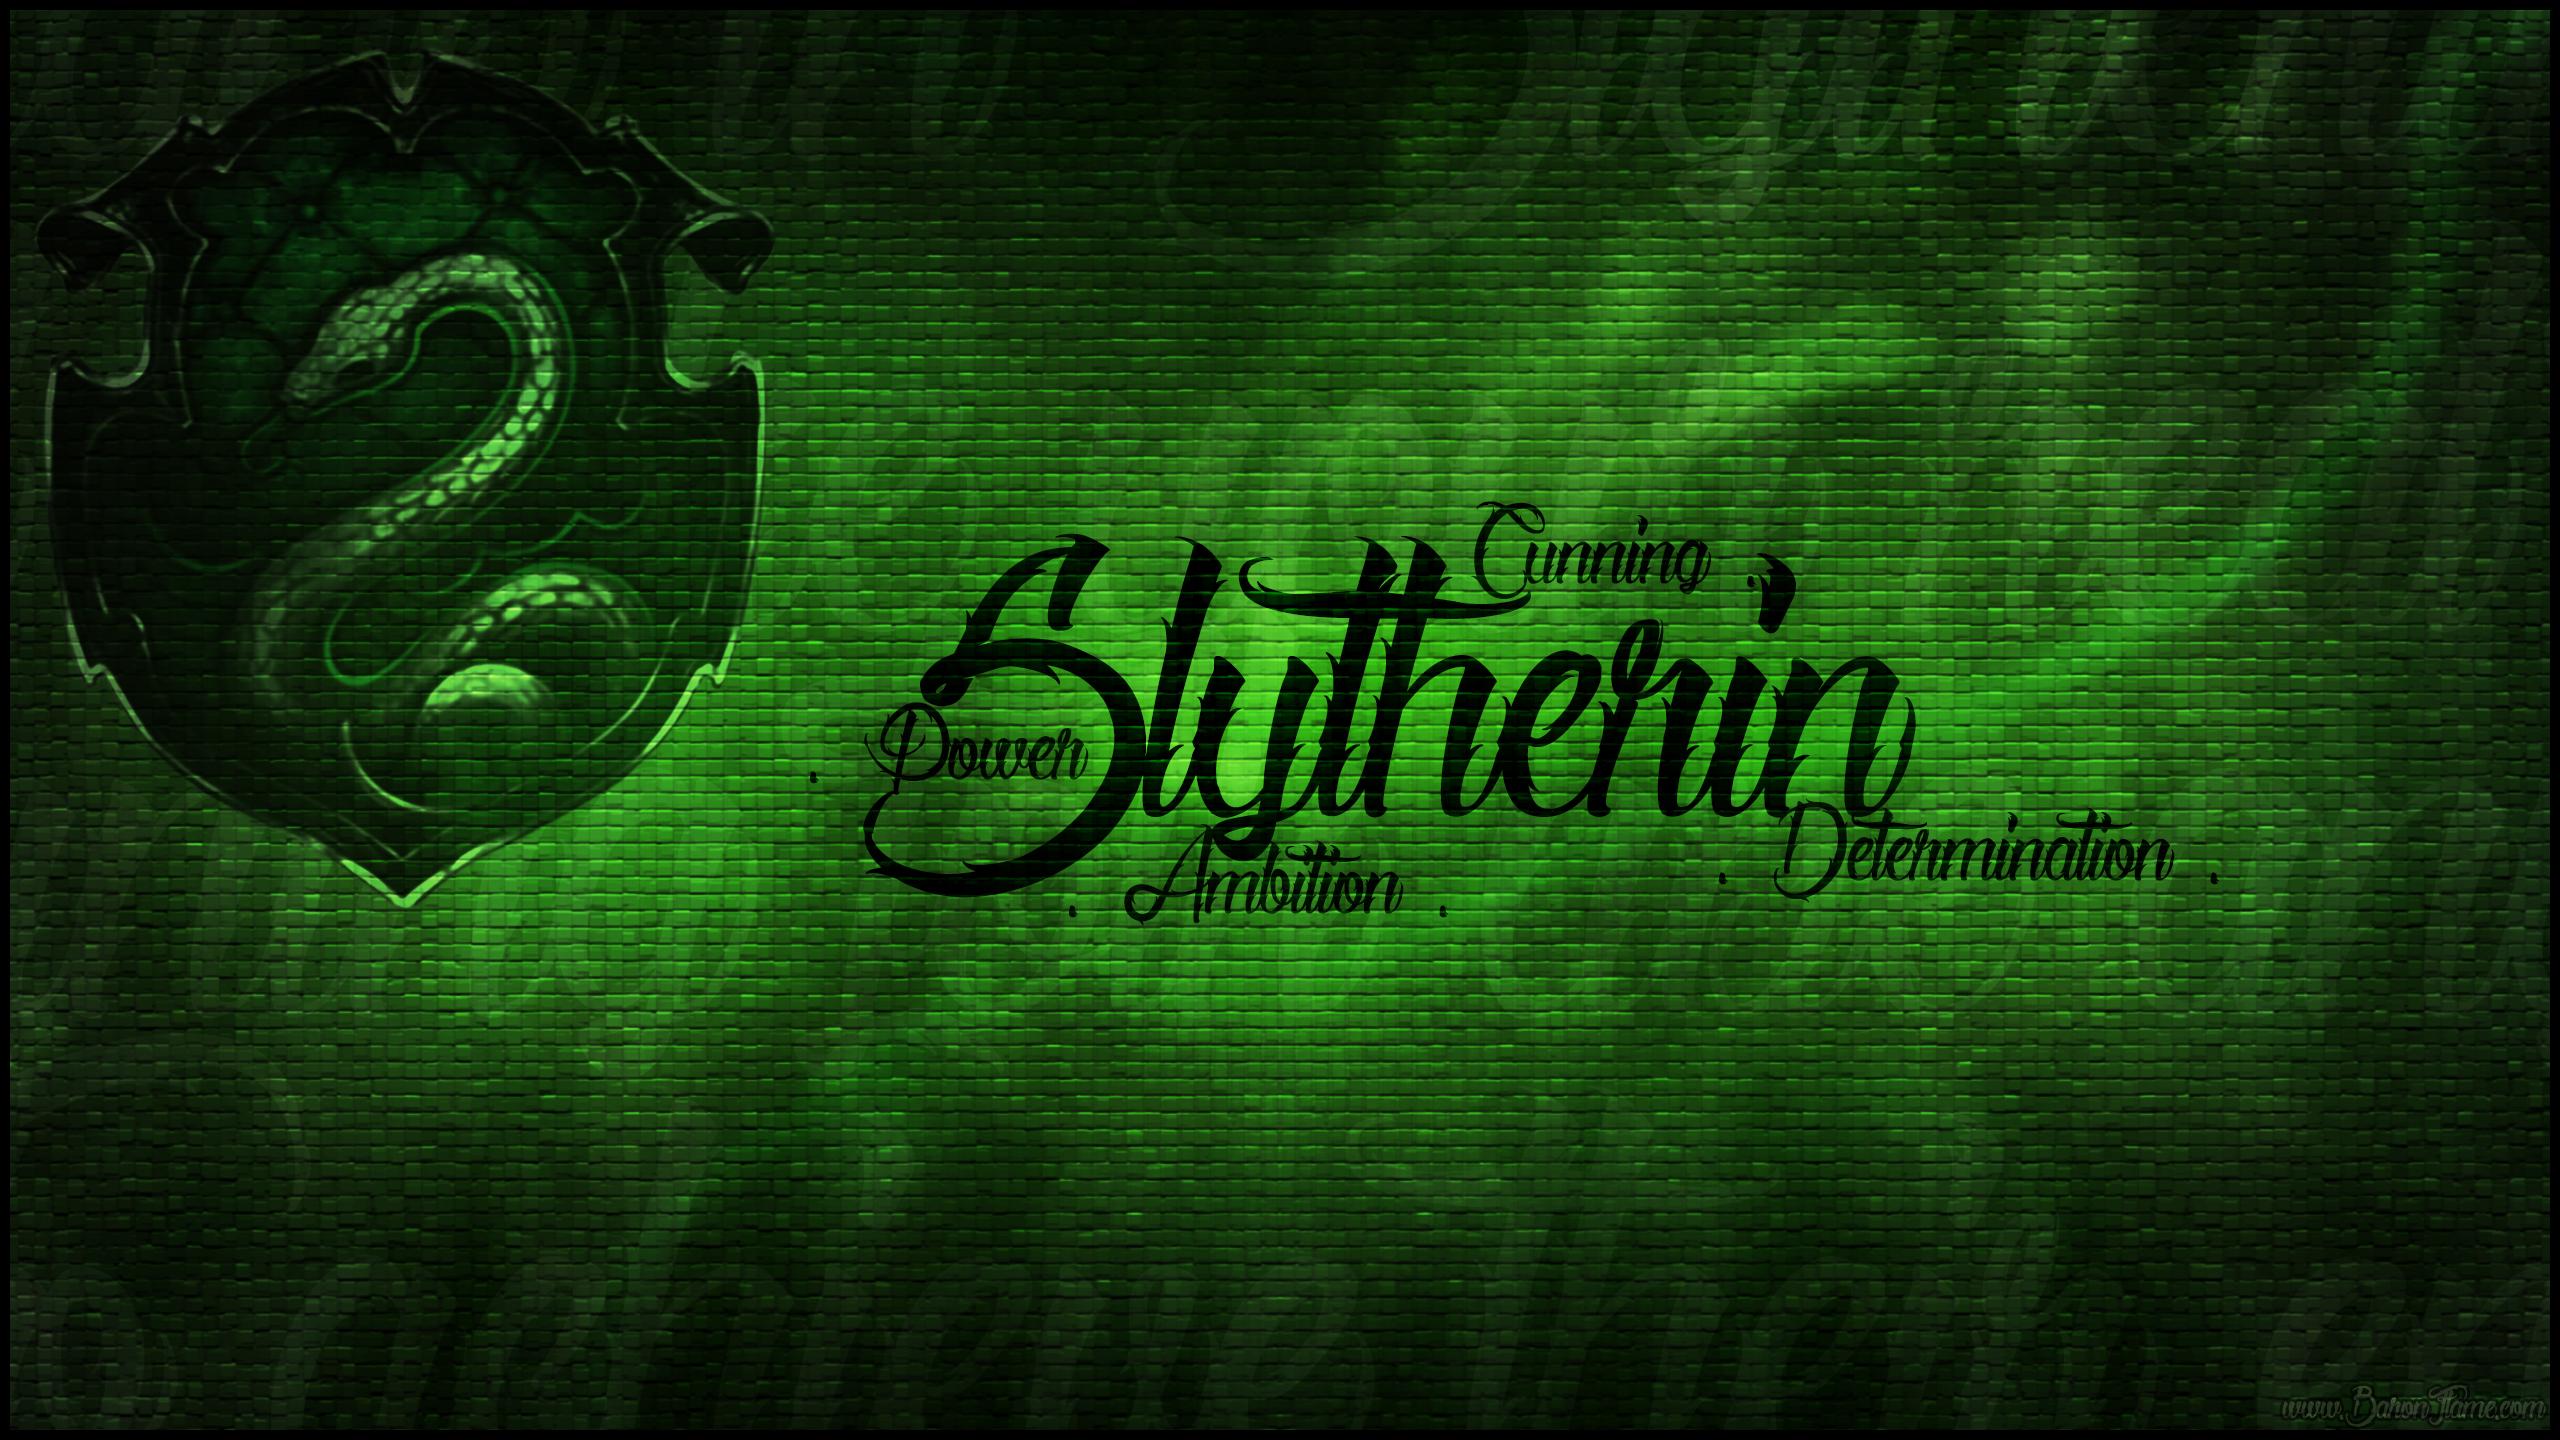 Slytherin Crest Wallpaper - WallpaperSafari